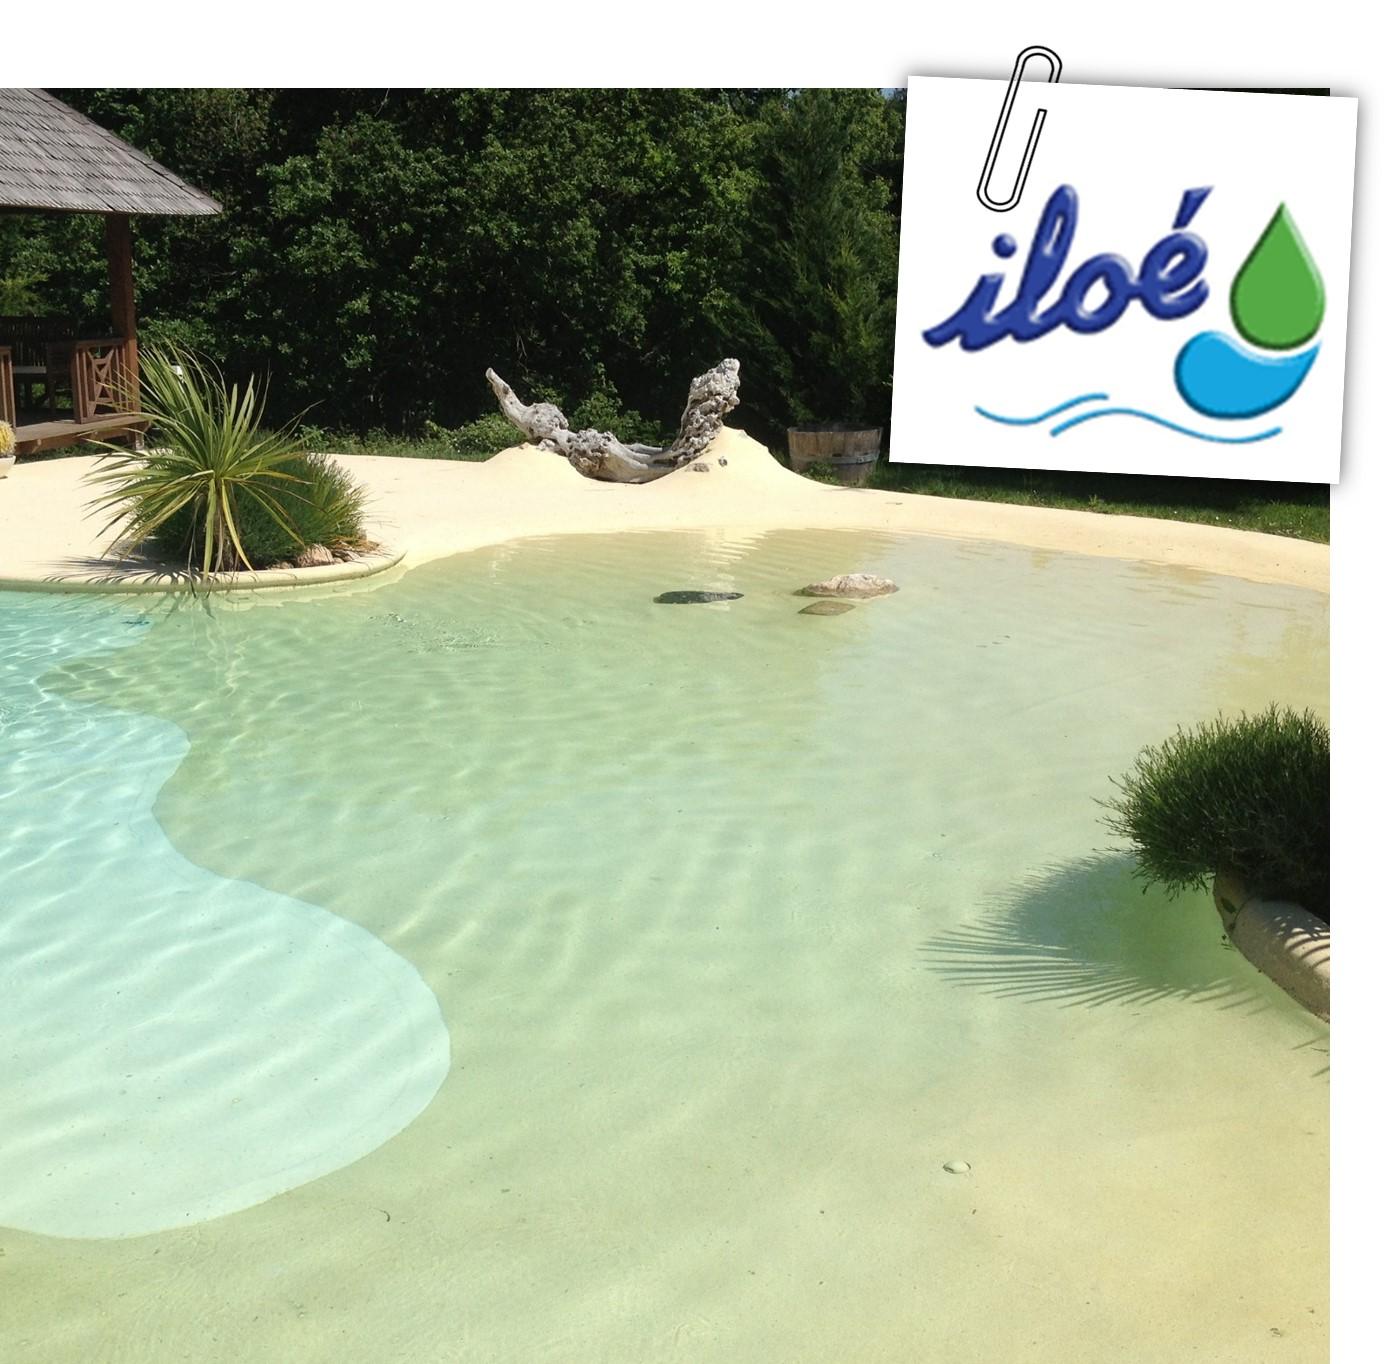 Vert services lorette 42 paysagiste jardin piscine for Piscine plage immergee